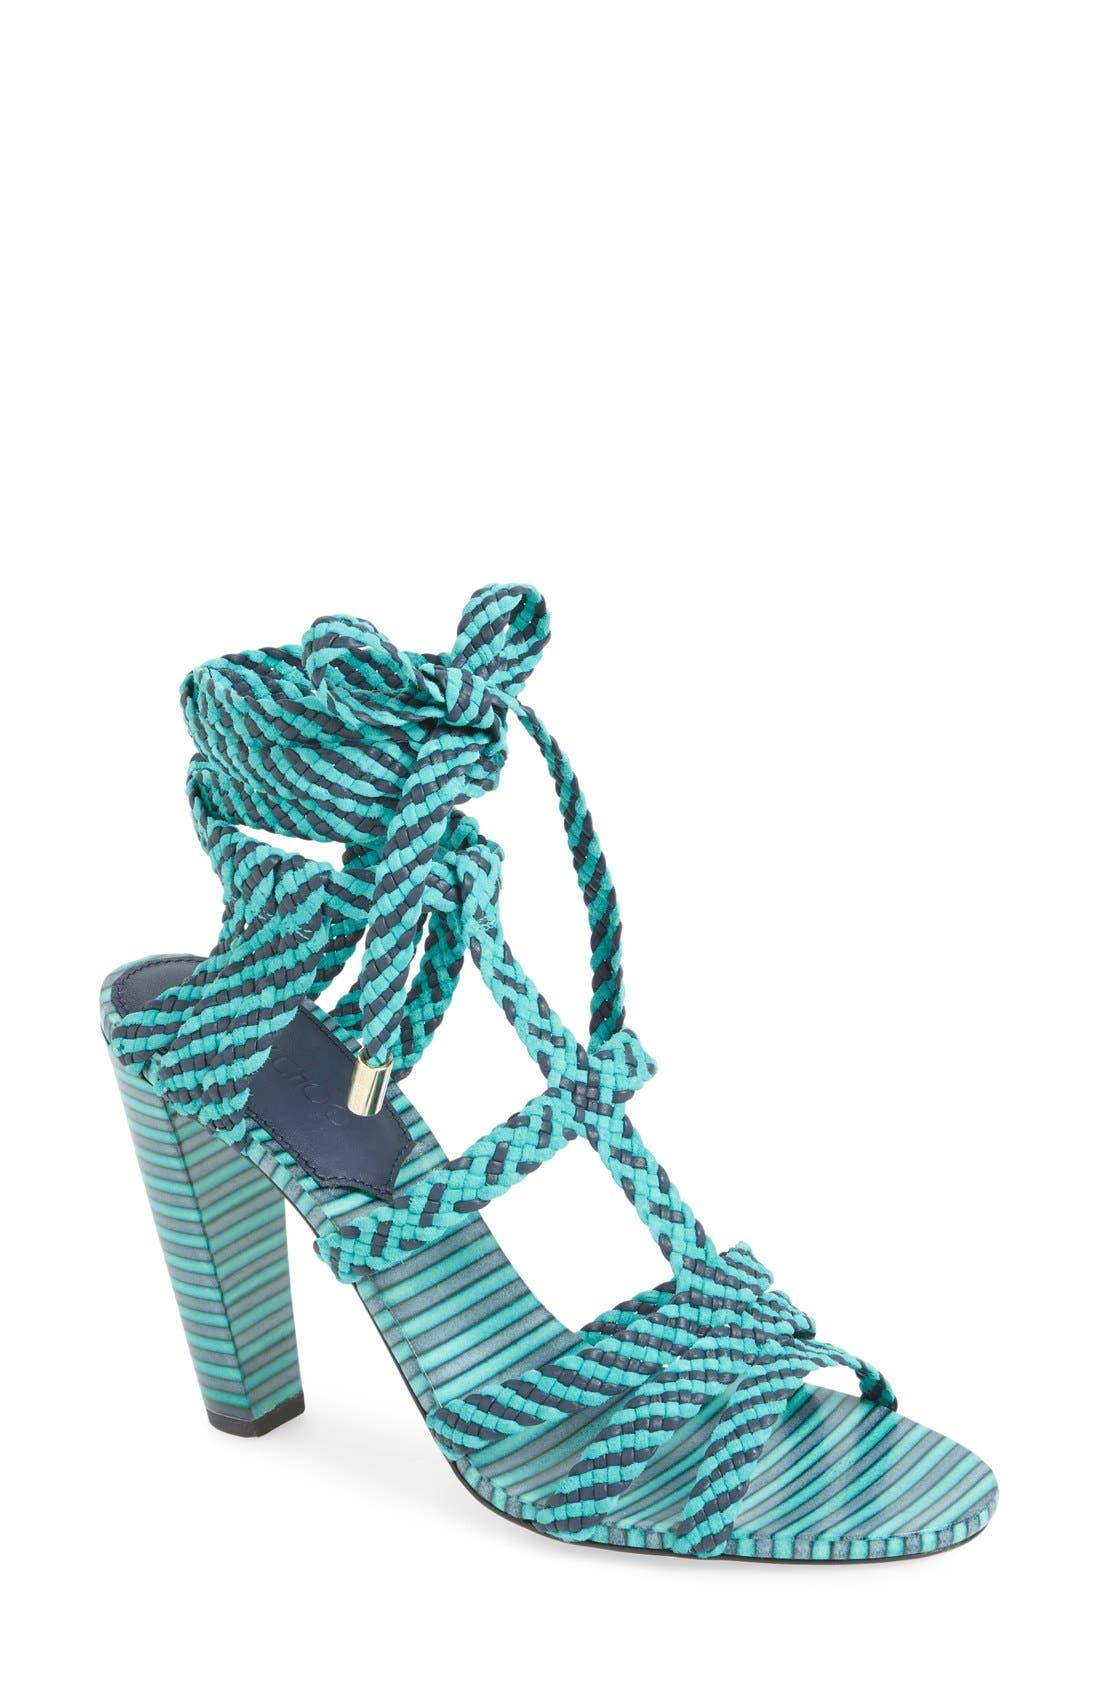 Alternate Image 1 Selected - Jimmy Choo 'Trix' Sandal (Women)